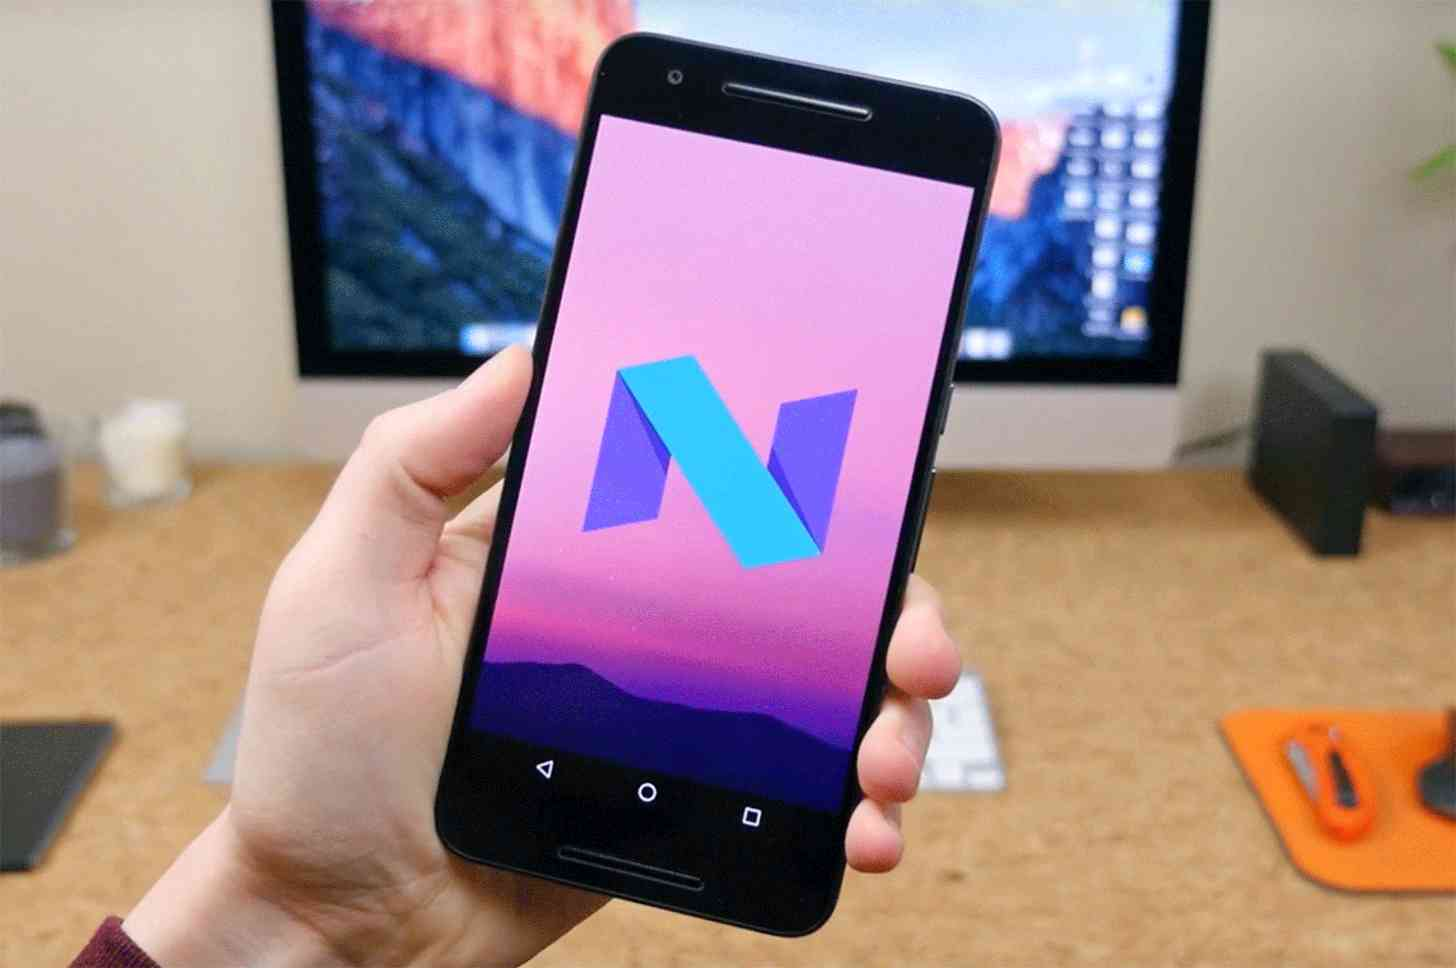 Android 7.0 Nougat Easter egg Nexus 6P